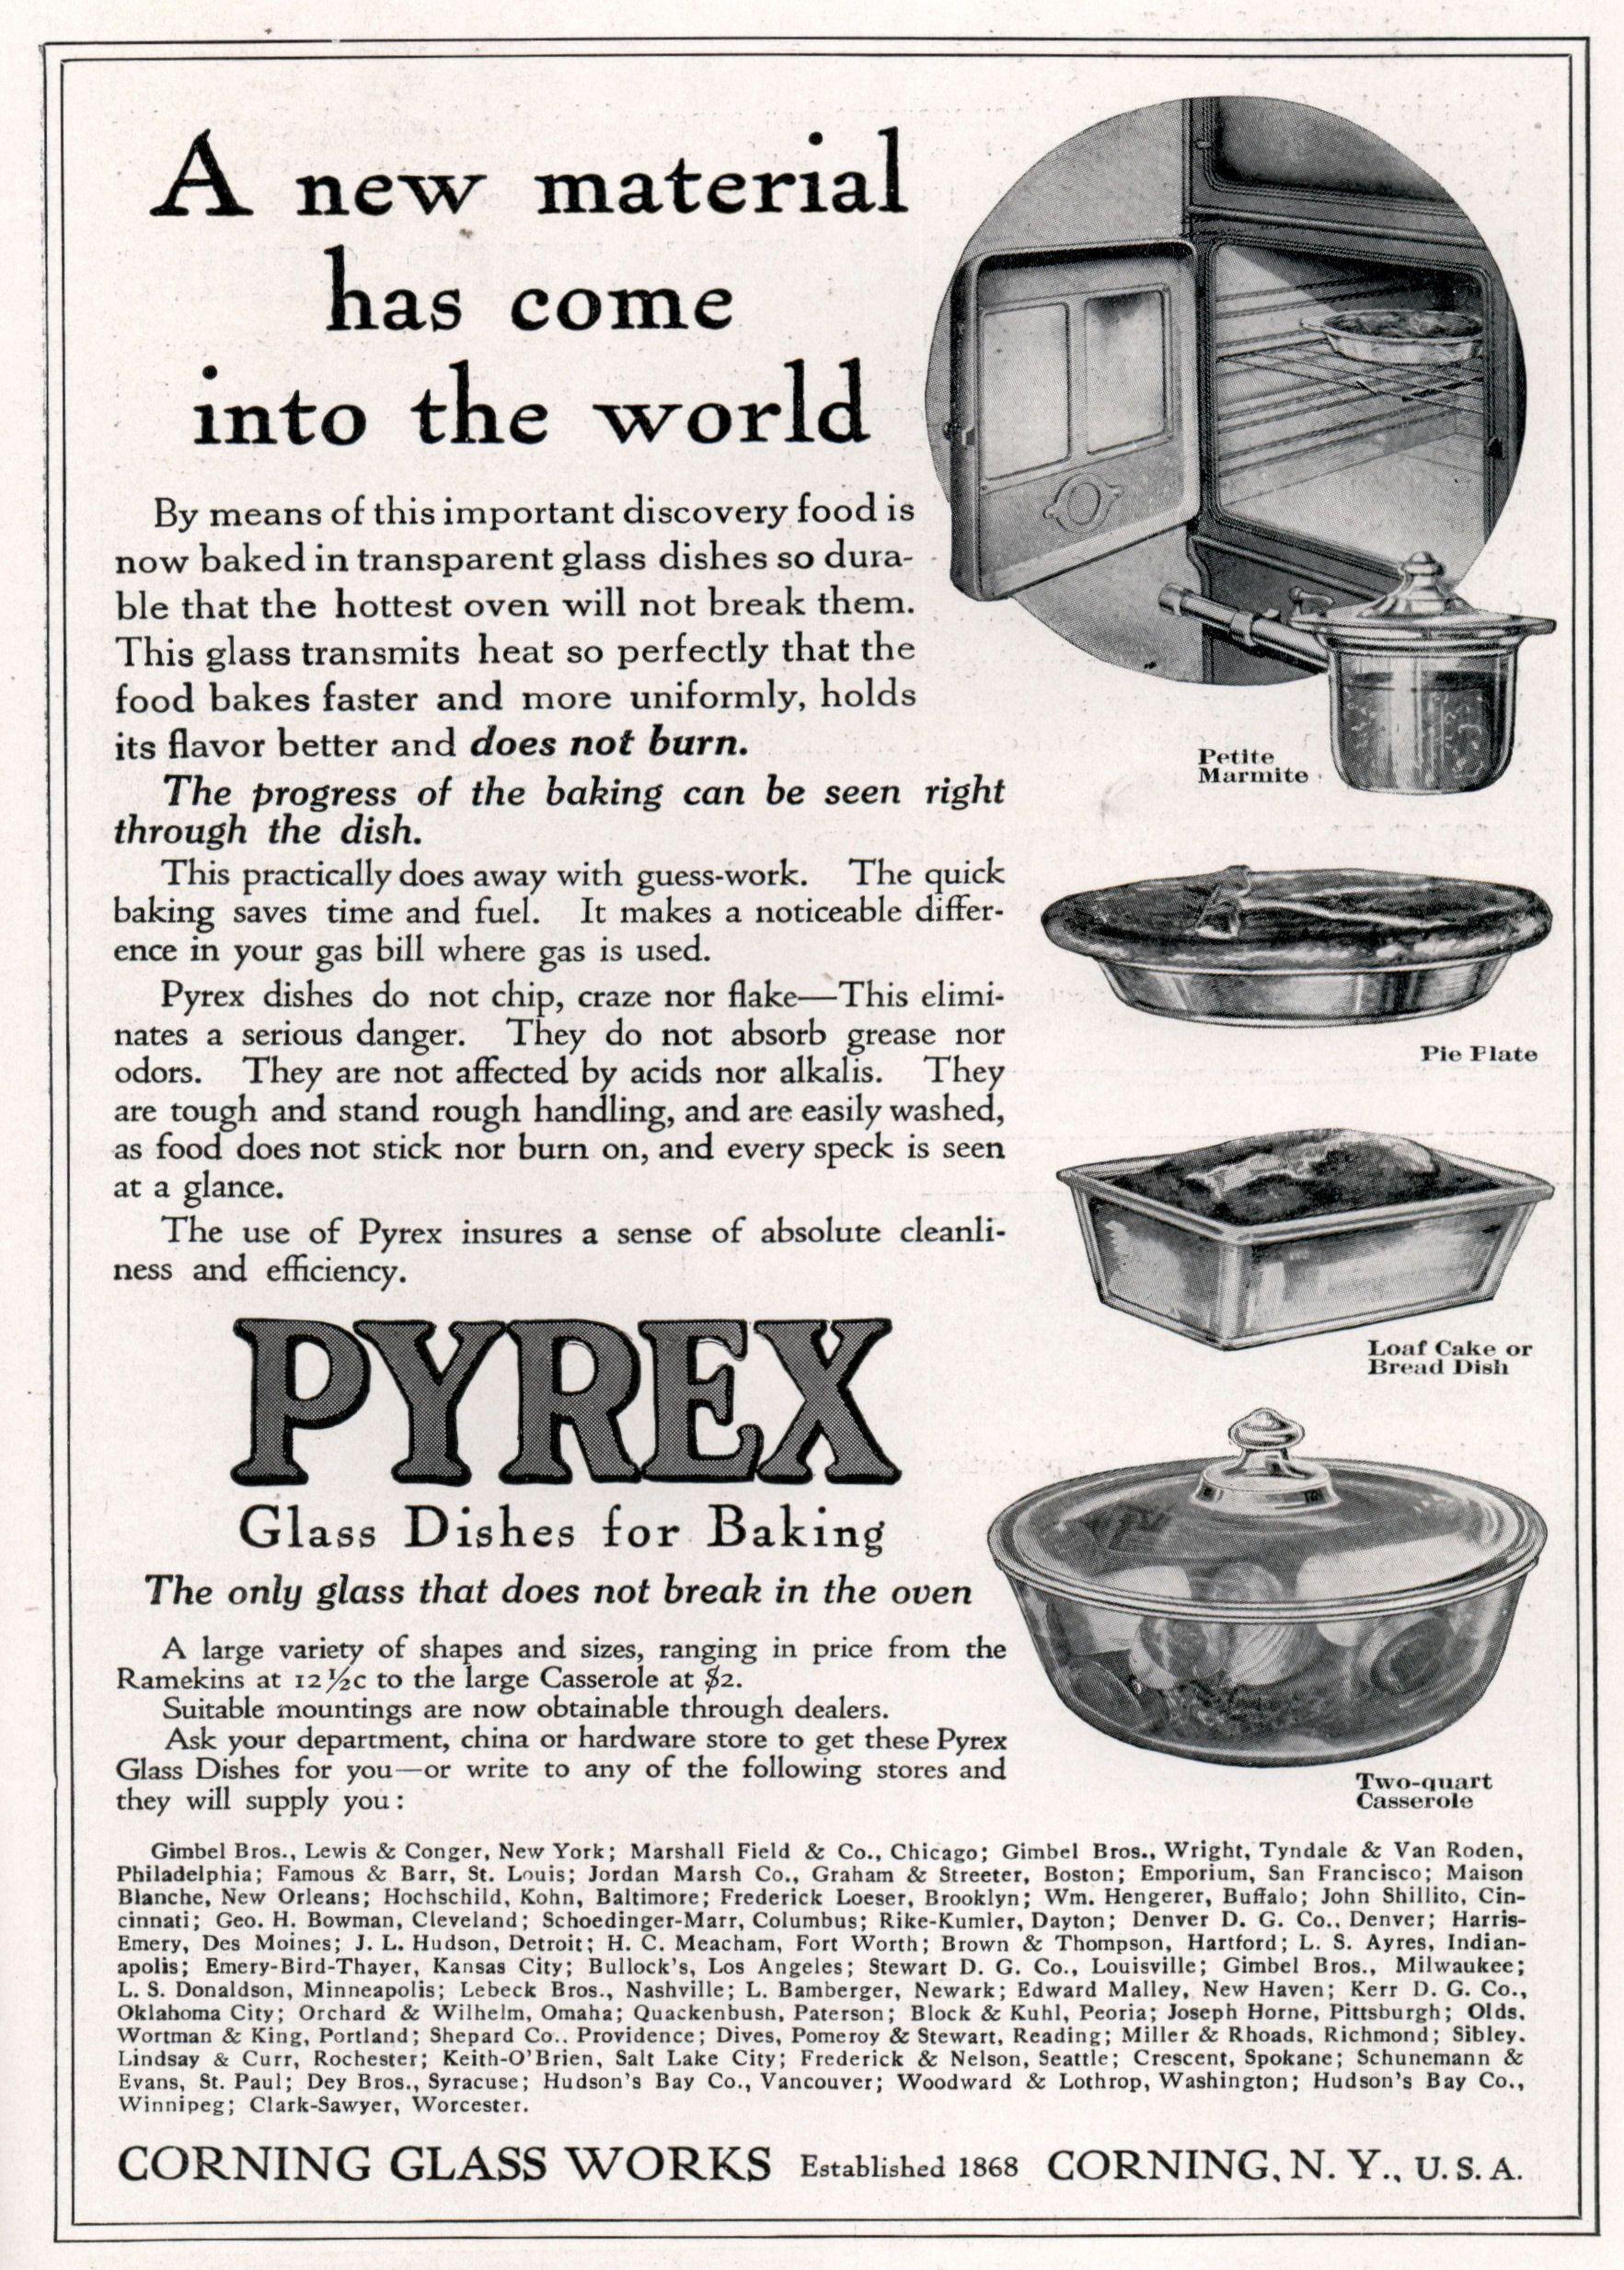 pyrex ad